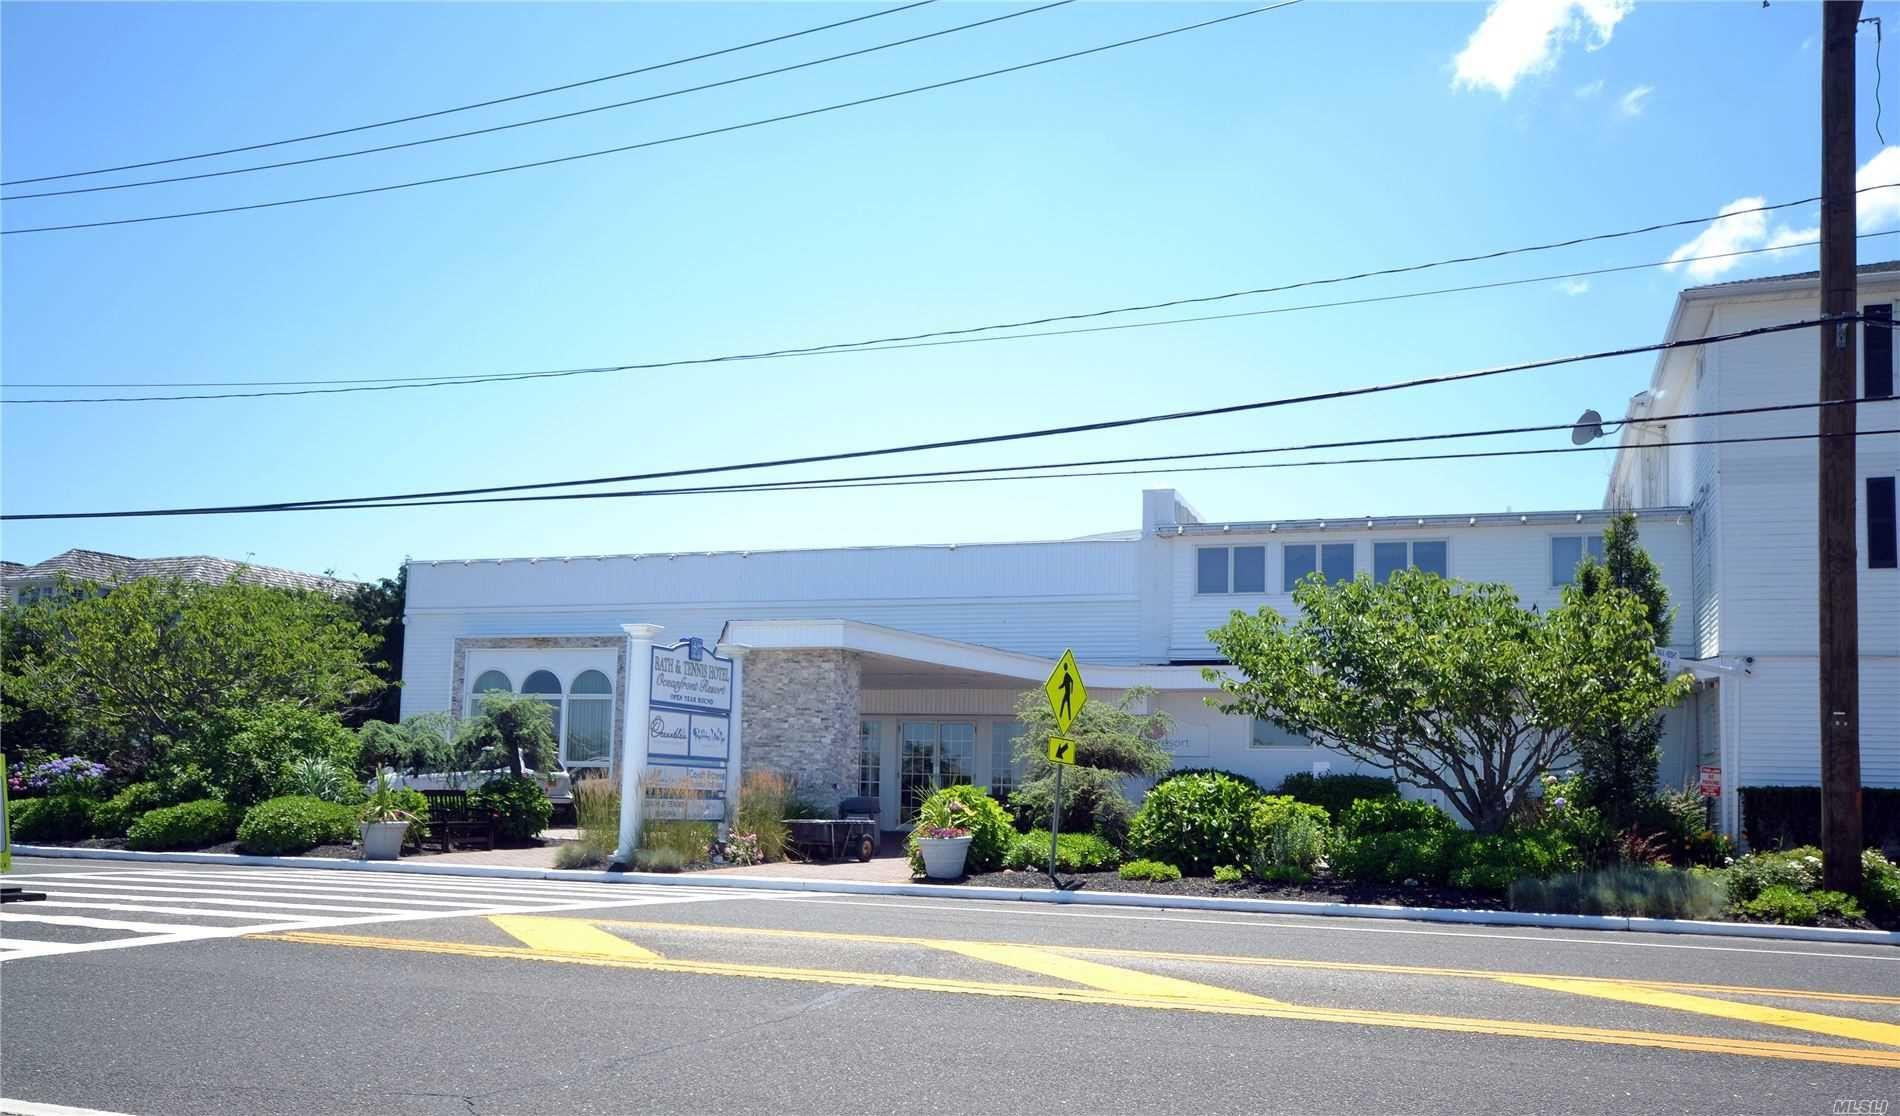 231 Dune, Westhampton Beach, NY 11978 - MLS#: 3202934